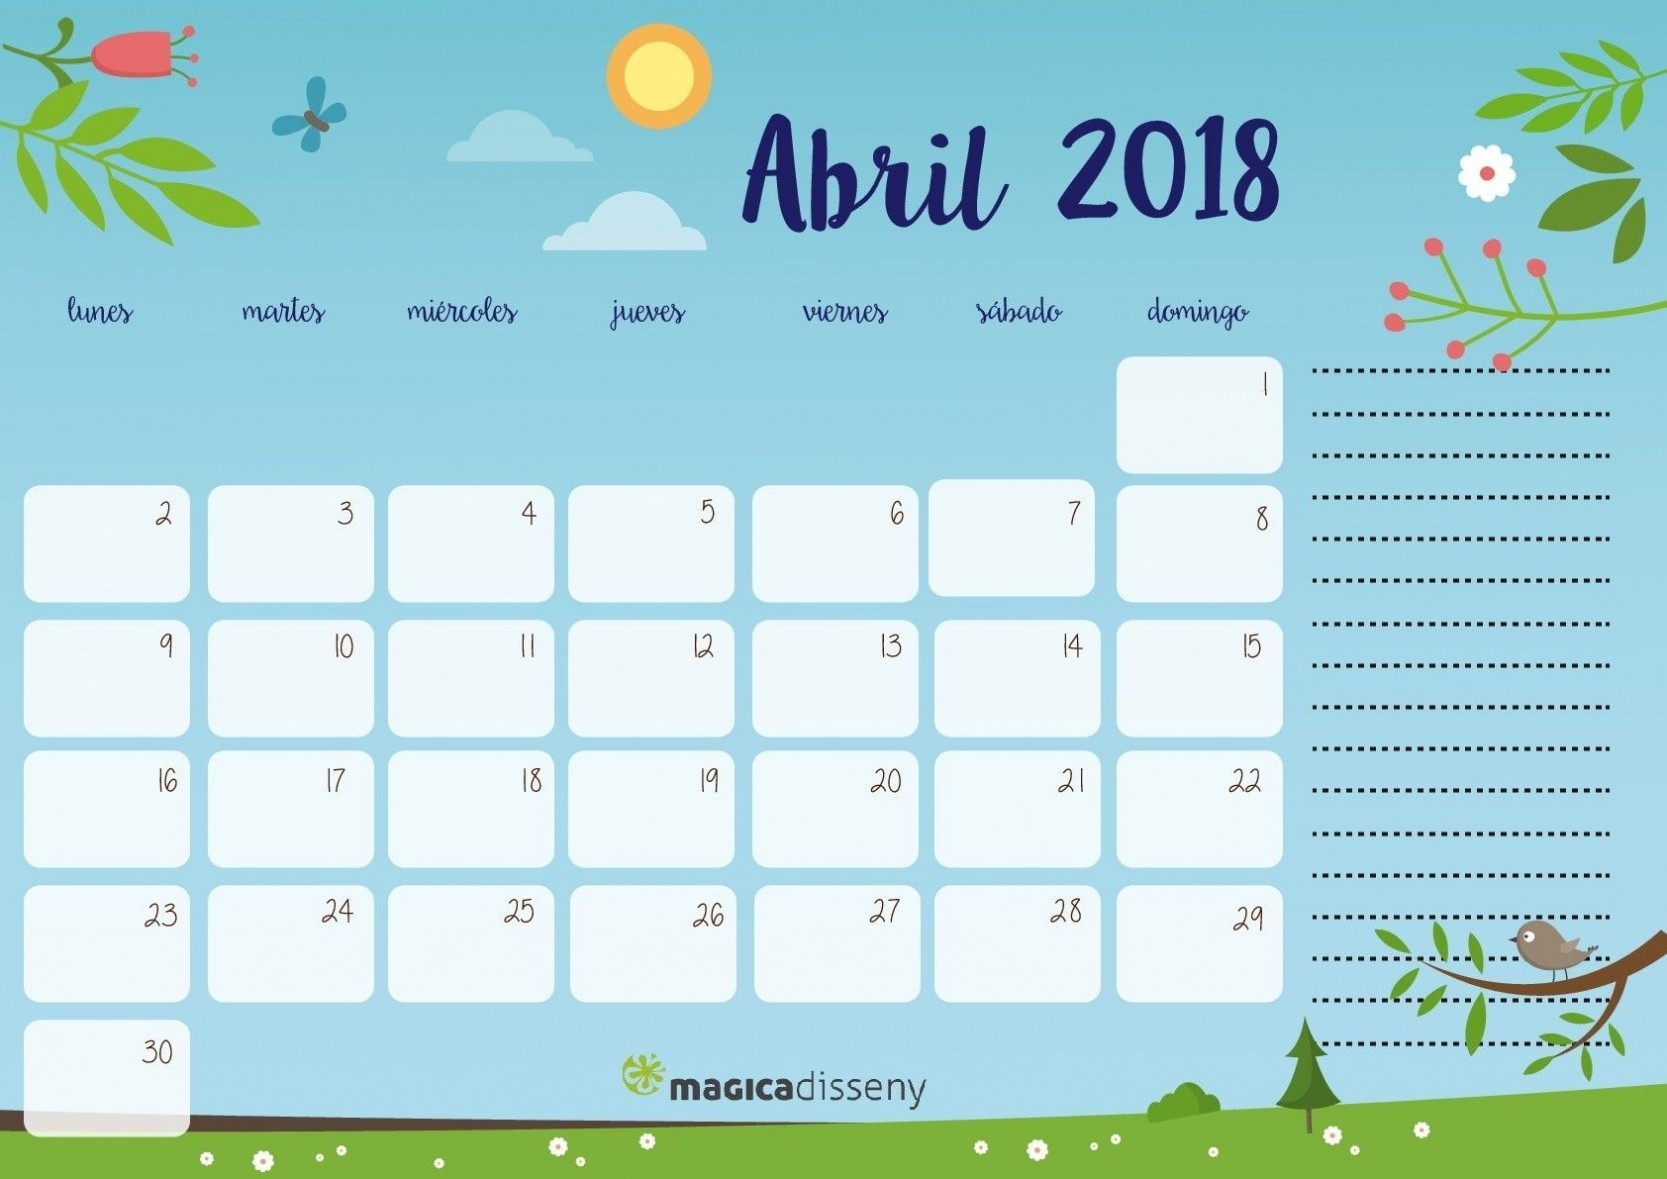 Calendario Abril 2017 Para Imprimir Pdf Actual Esto Es Exactamente Imprimir Calendario Desde Word Of Calendario Abril 2017 Para Imprimir Pdf Más Recientes 227 Best organiza§£o Images On Pinterest